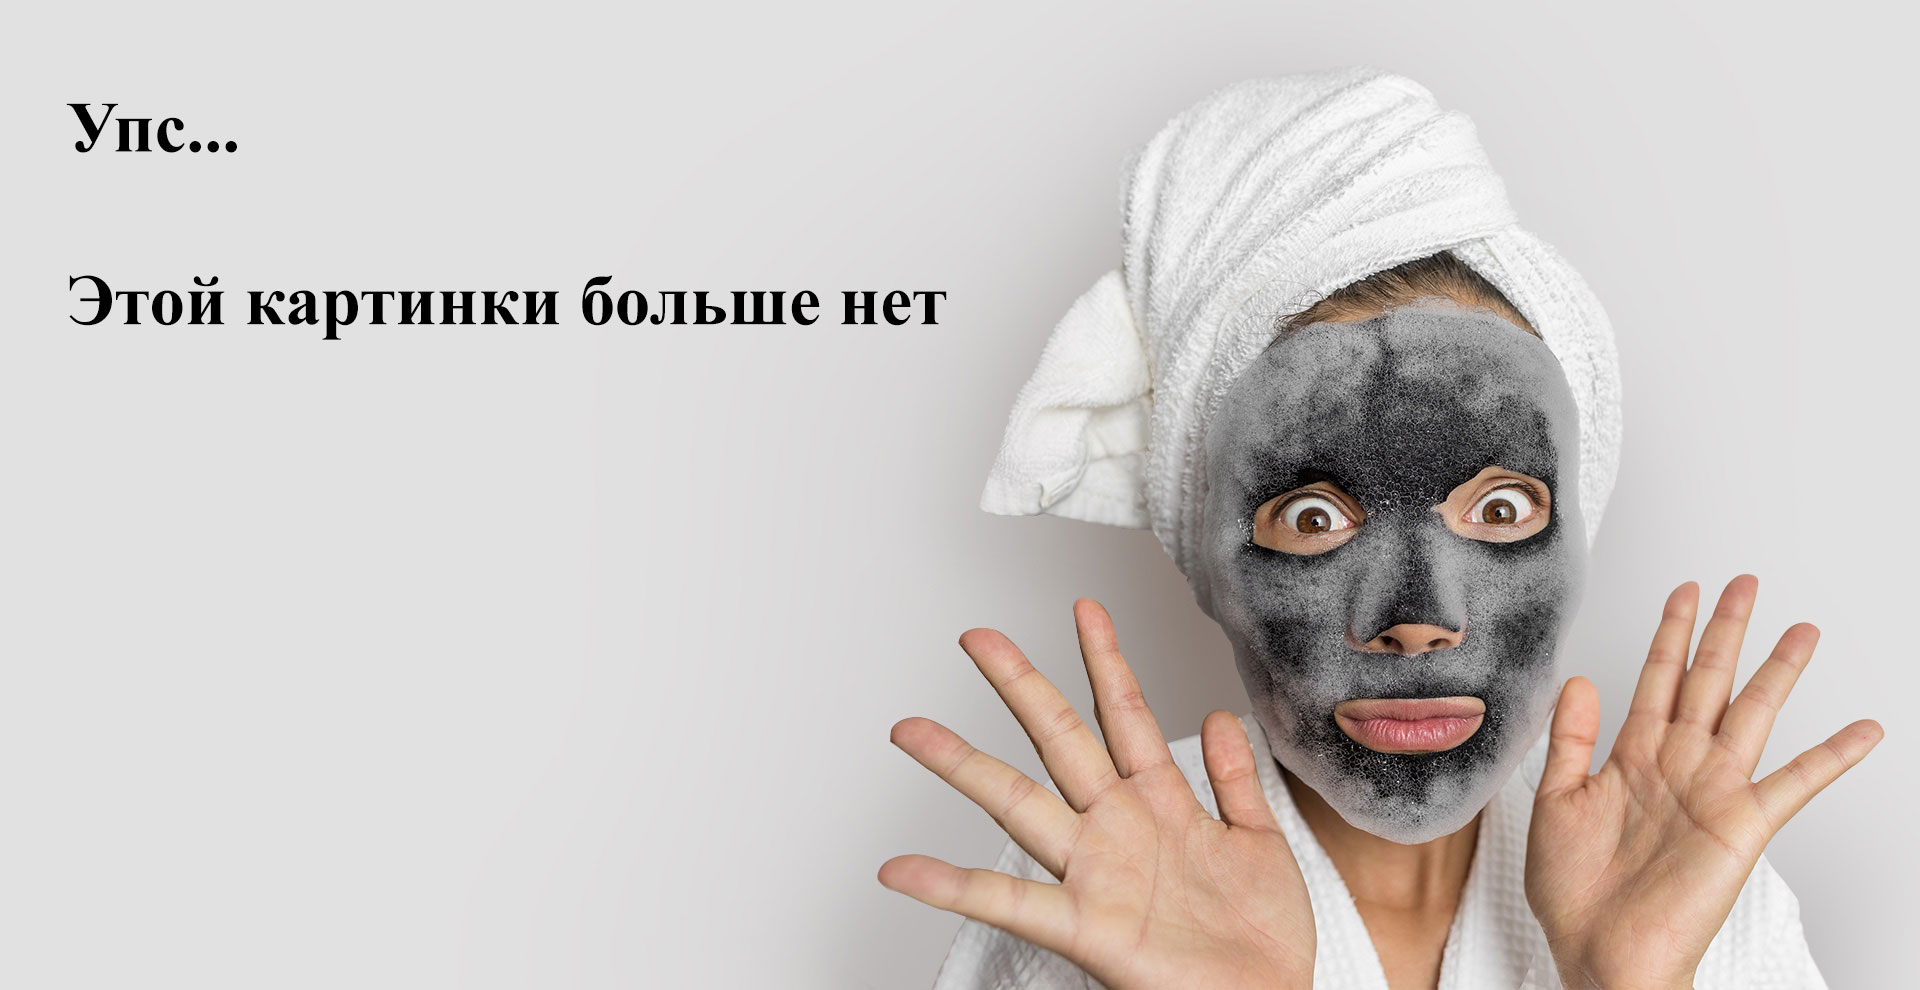 Enough, Тональный крем Collagen Moisture №23, SPF 15, 100 мл